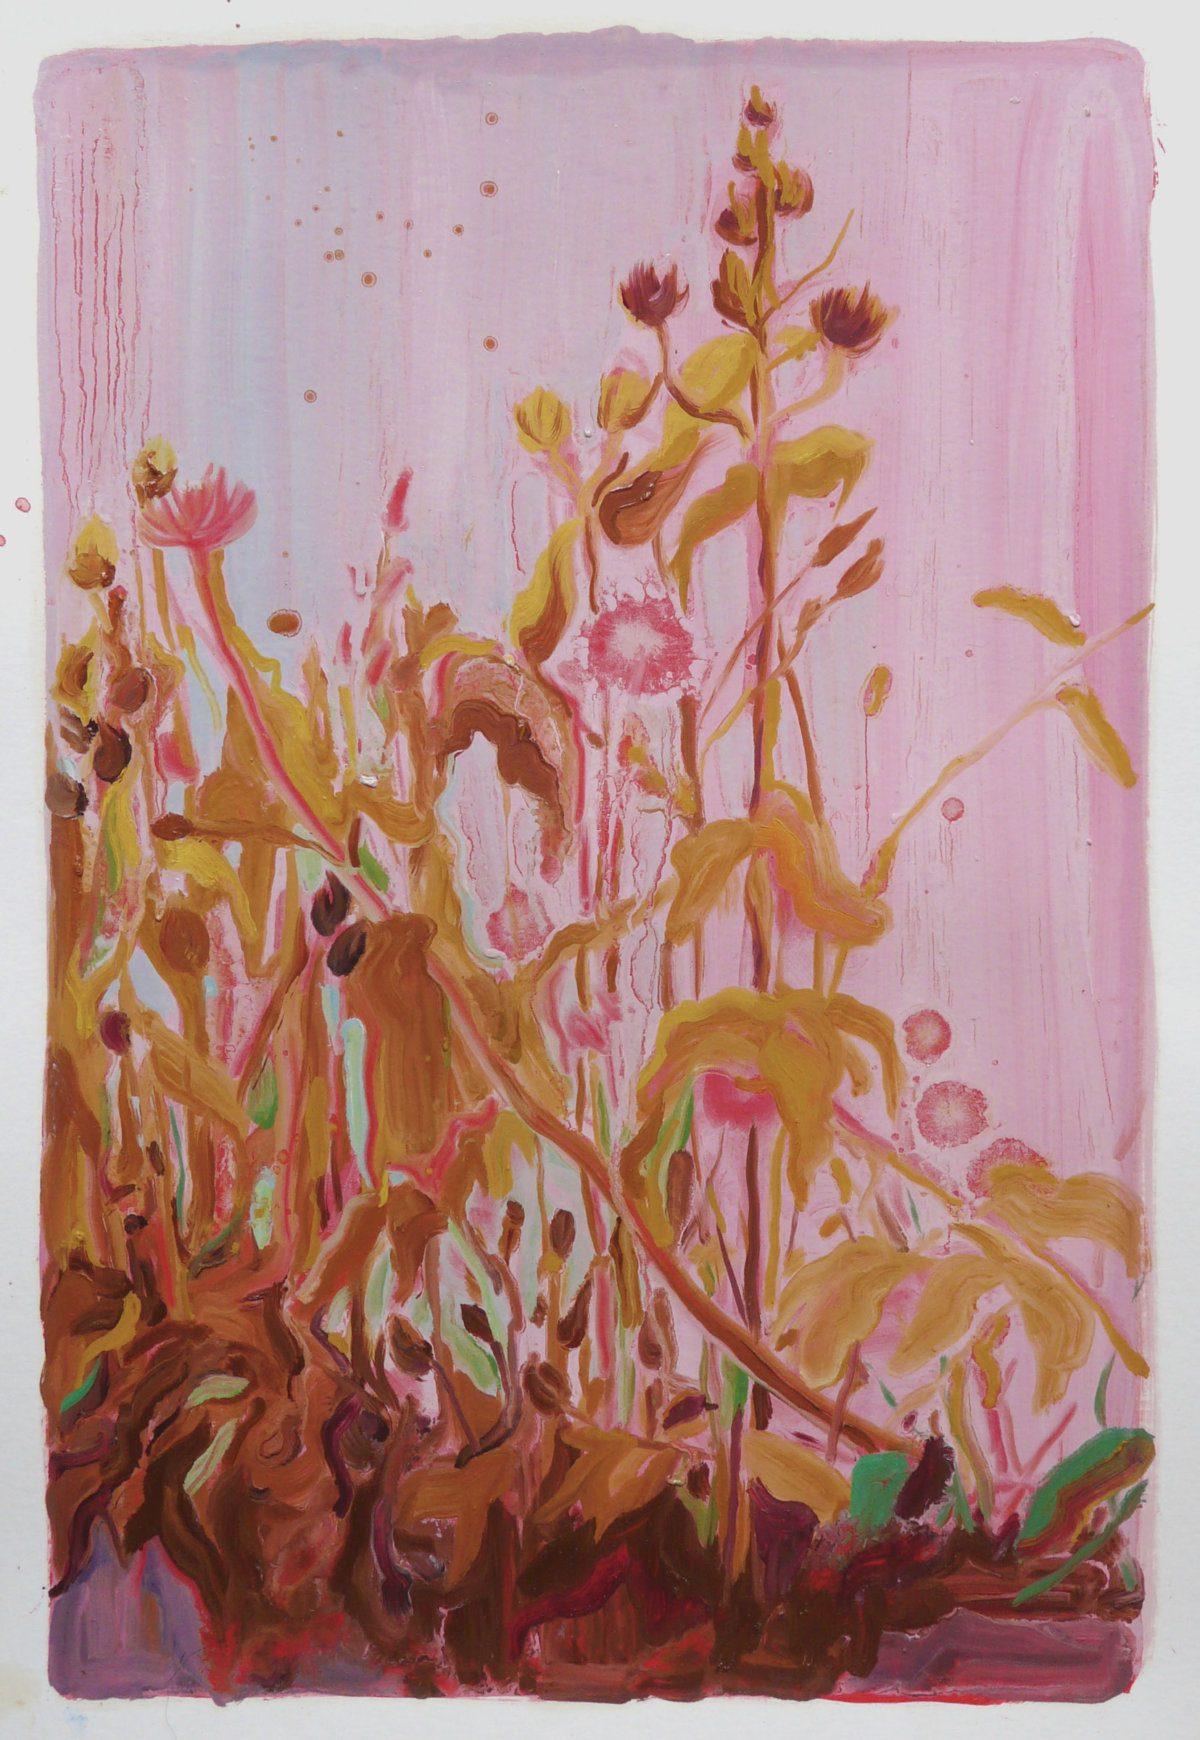 Alice Brasser Bermbloemen # 6, 50 x 35 cm, oil on paper, 2016